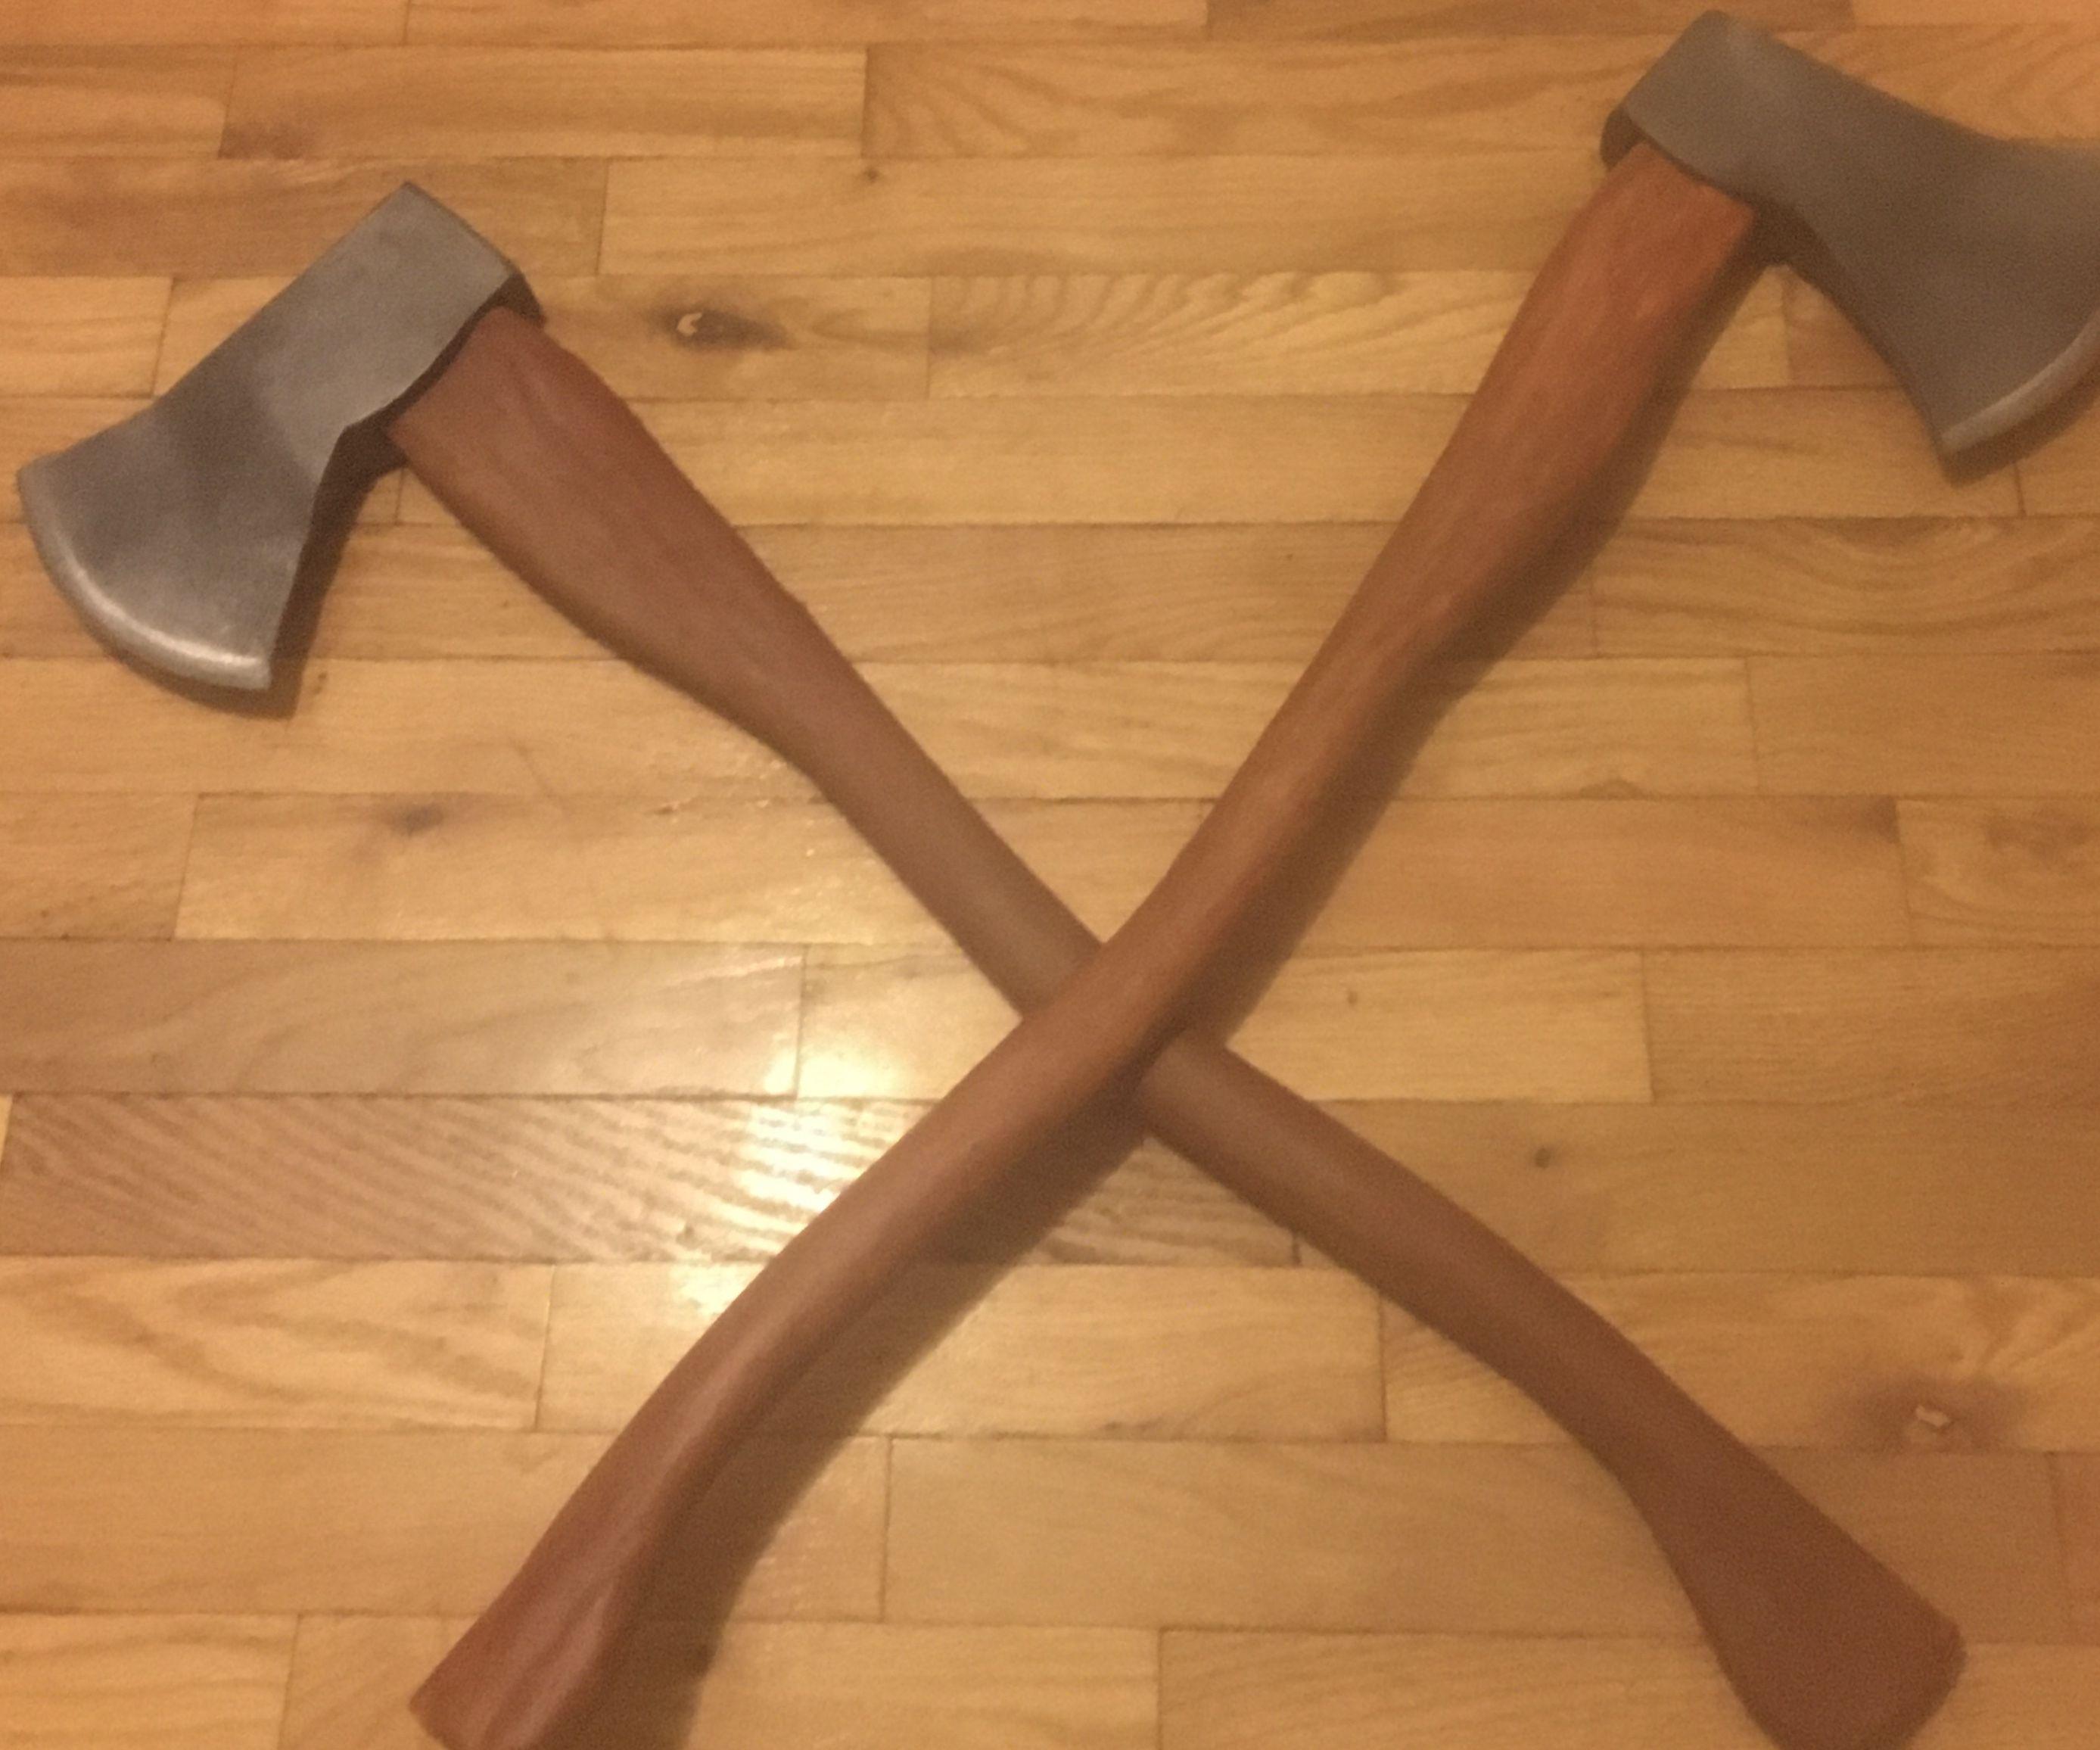 How to Make a Prop Axe